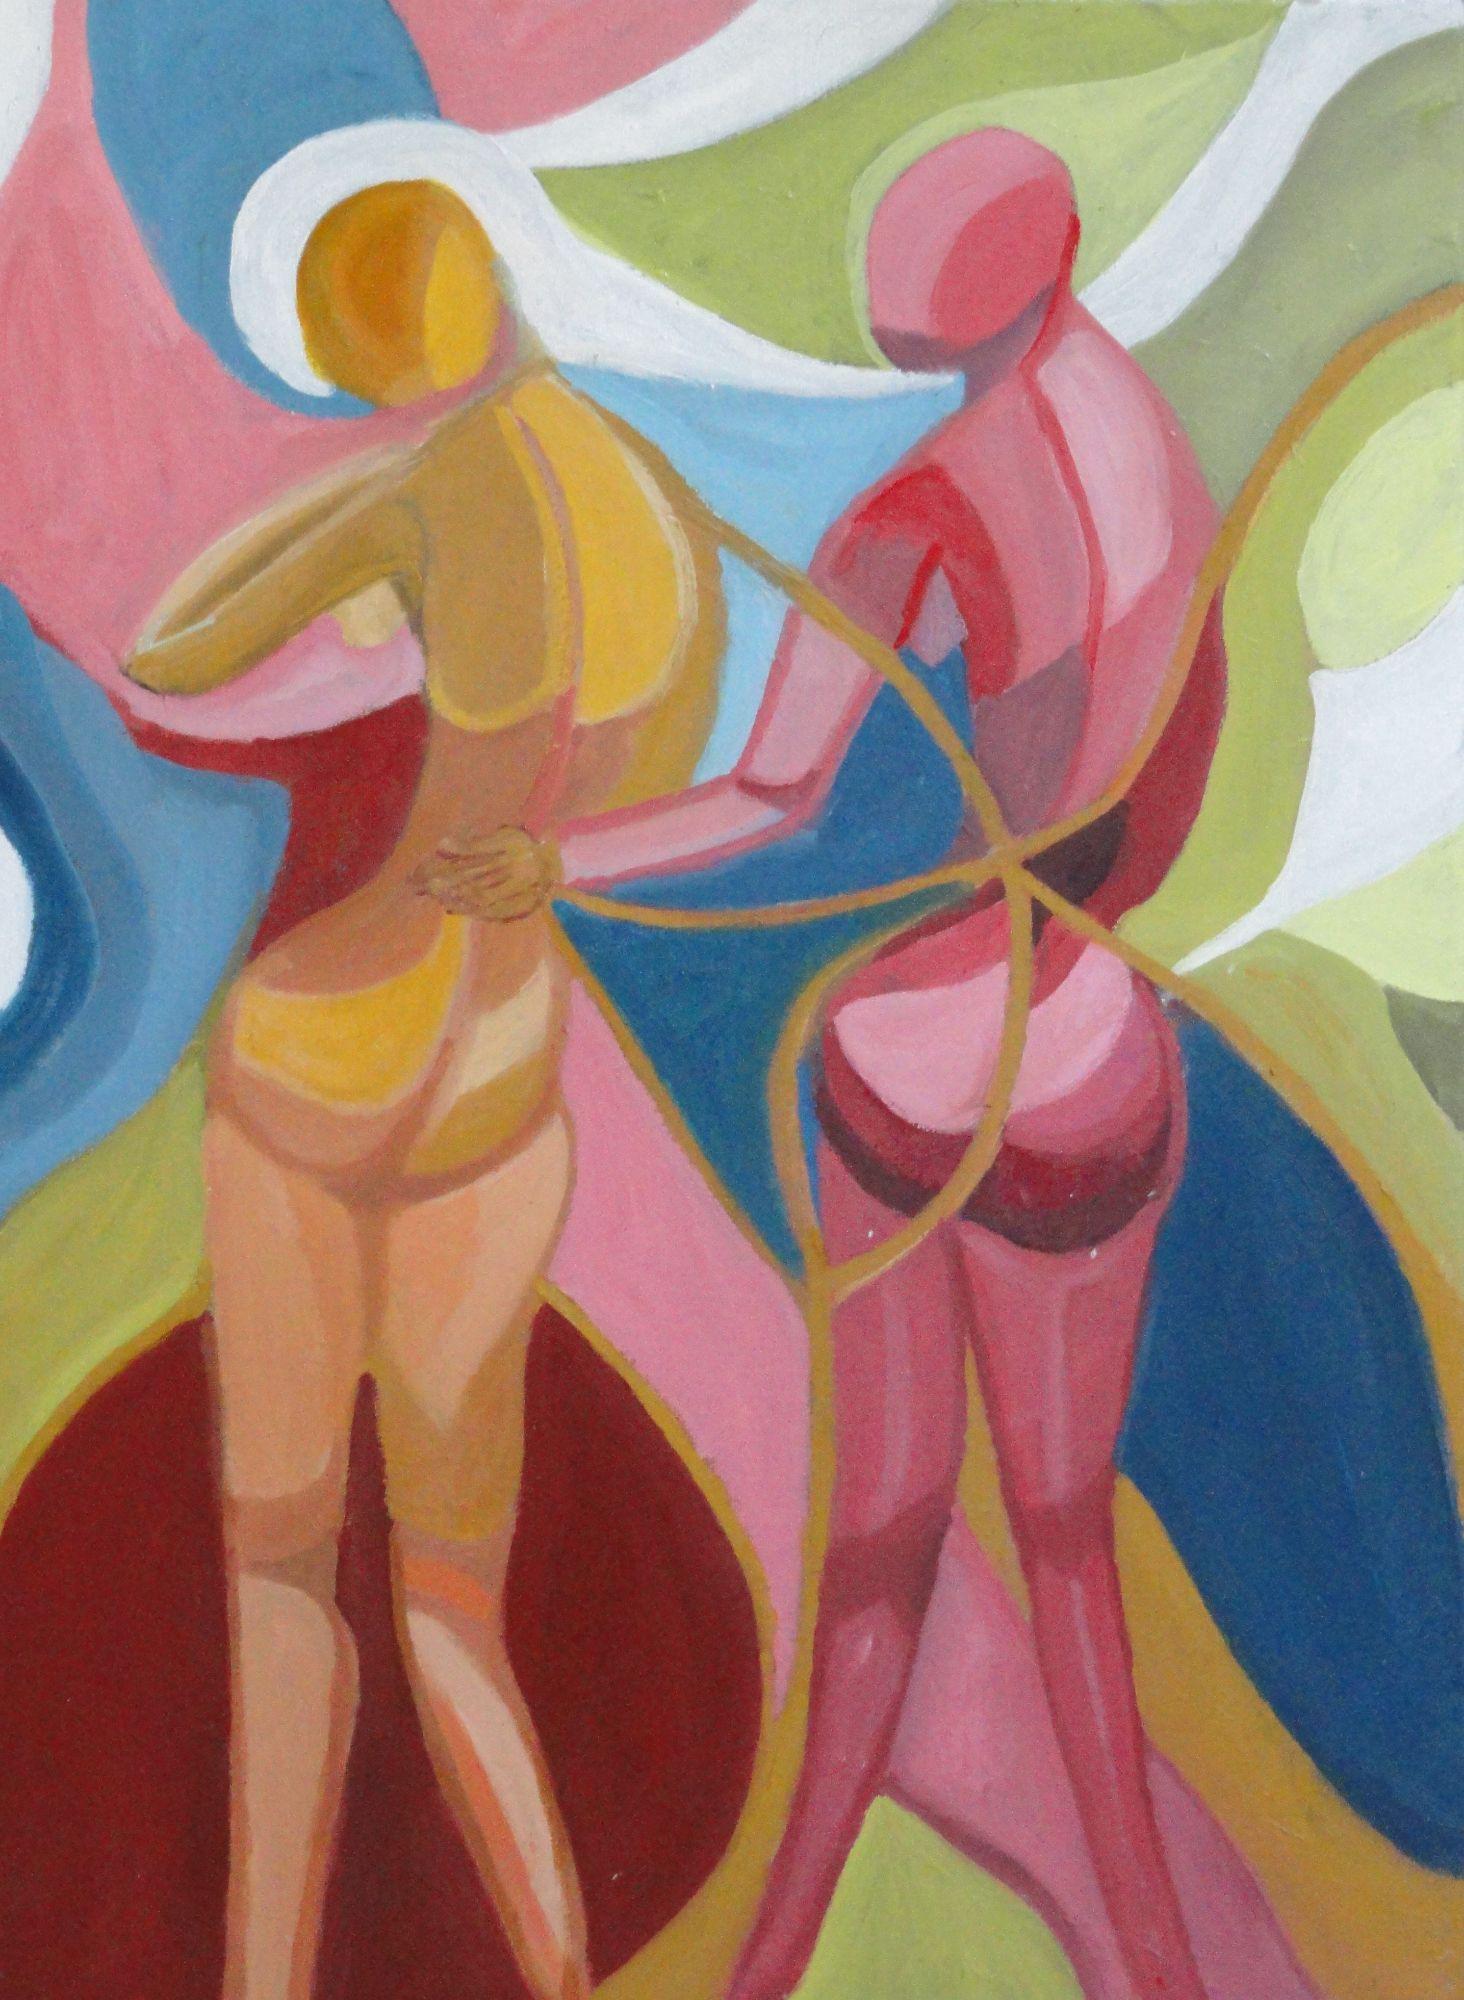 Affection  ________________________________  varnished gouache  (56cm x 41cm)           £90